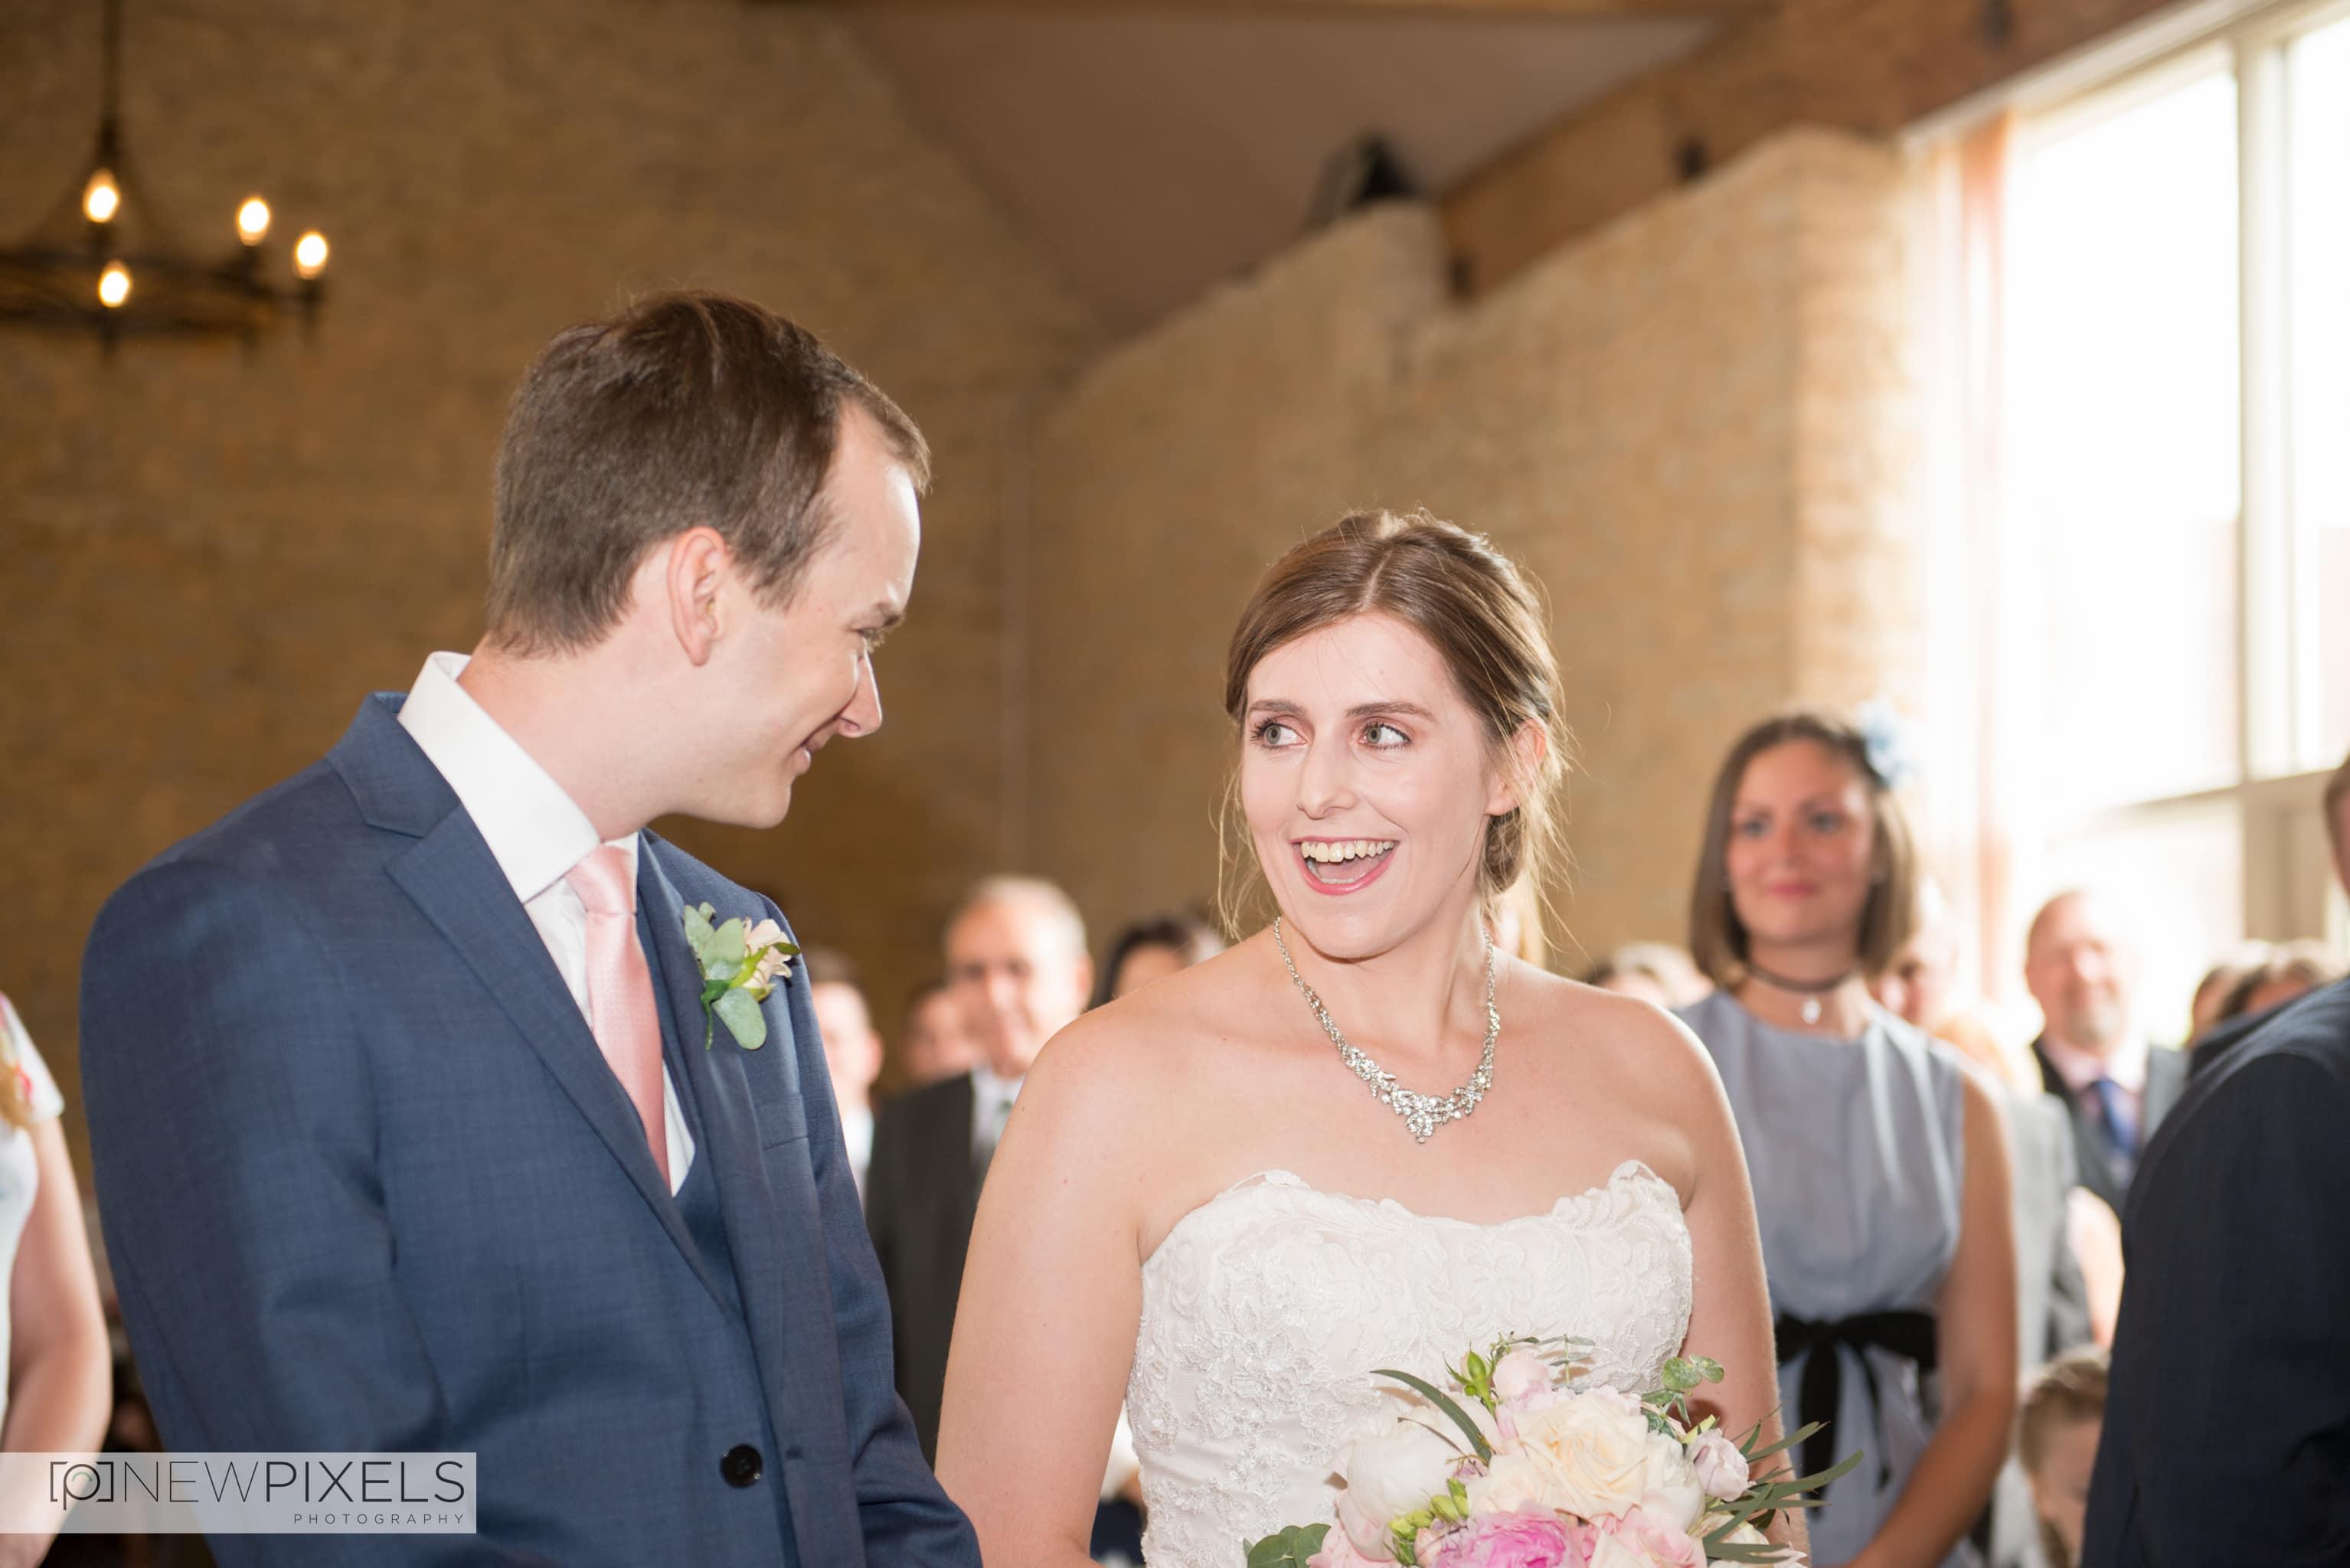 Hertfordshire Wedding Photography- New Pixels-22